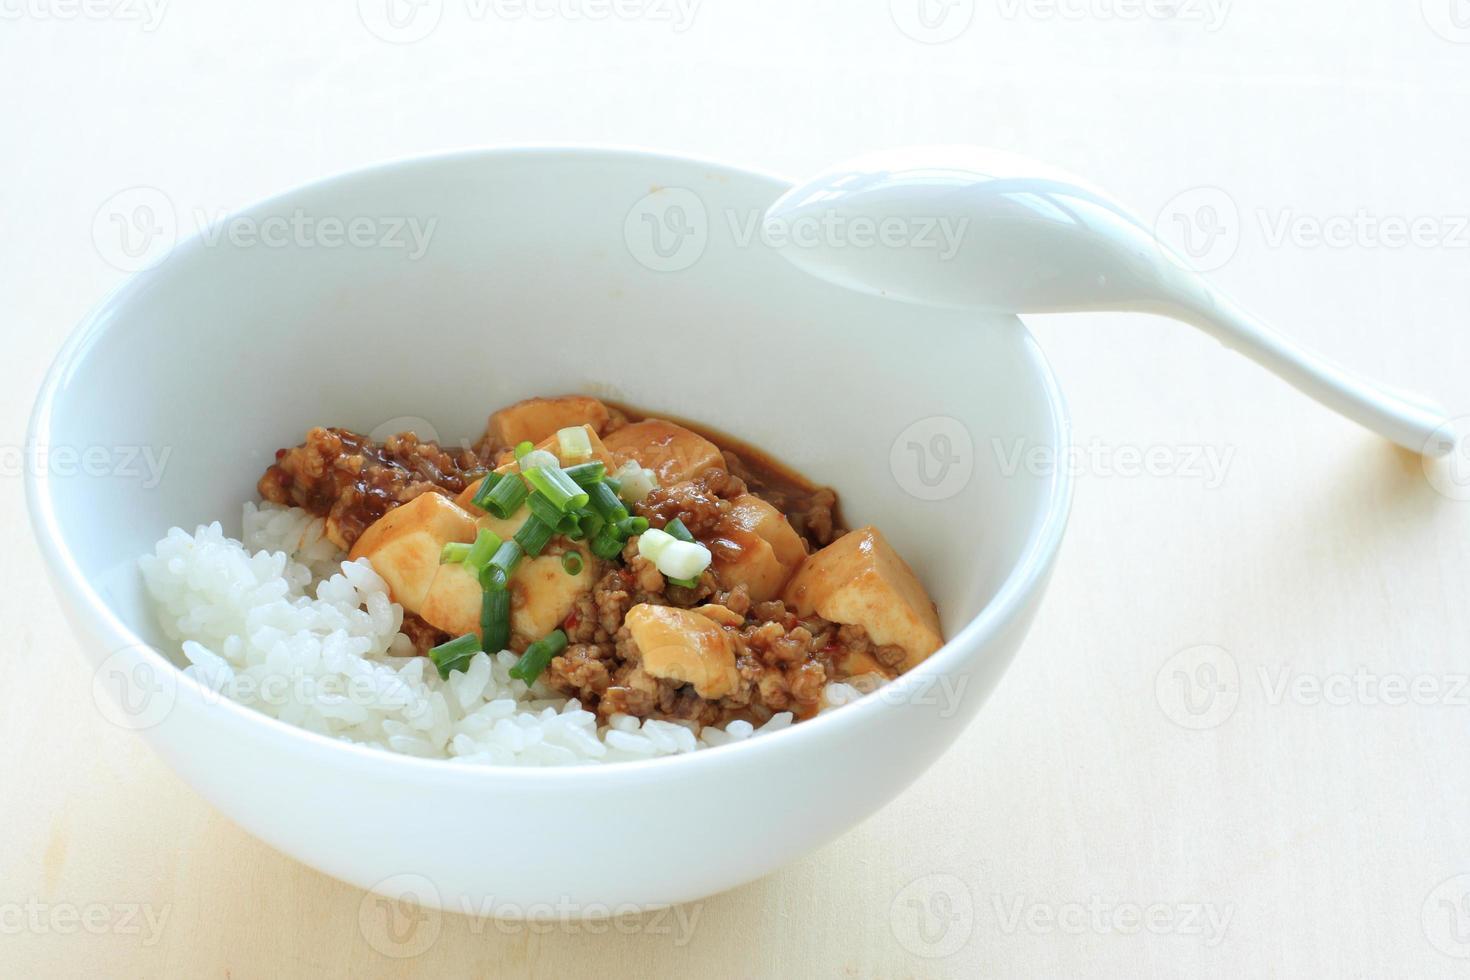 comida chinesa, mapo tofu com arroz foto